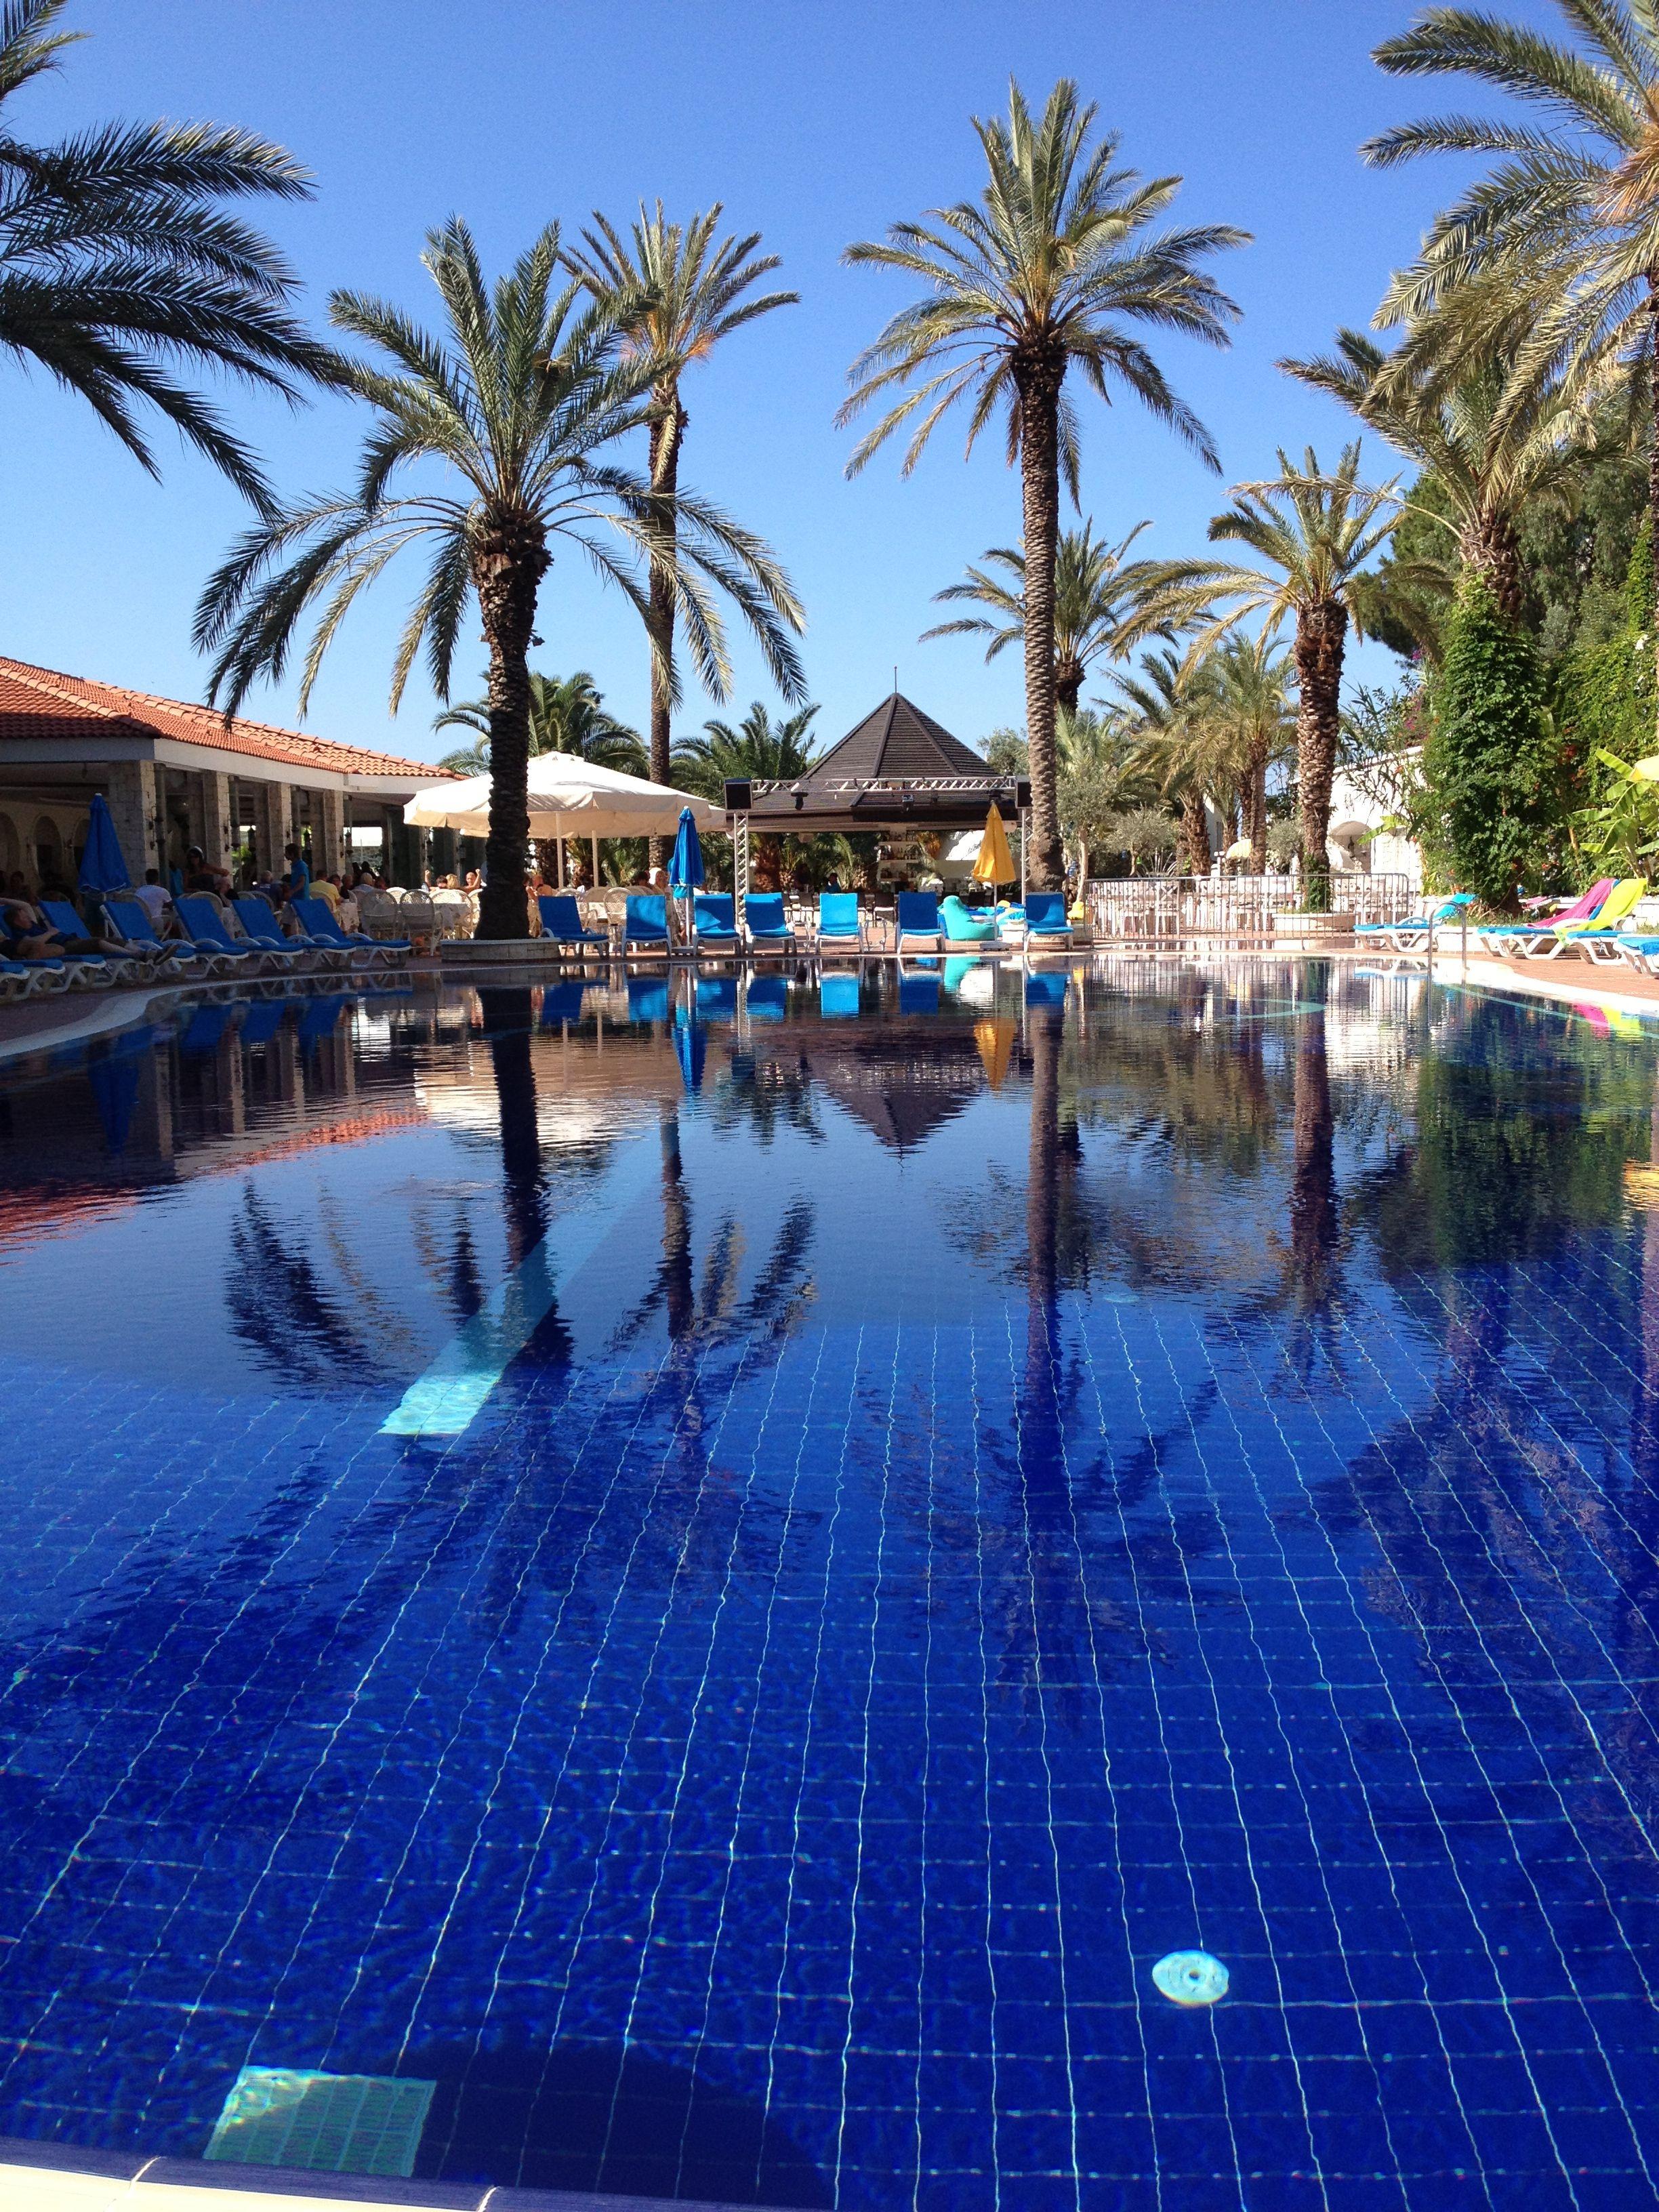 Coella Tropical Beach Resort The Best Beaches In World